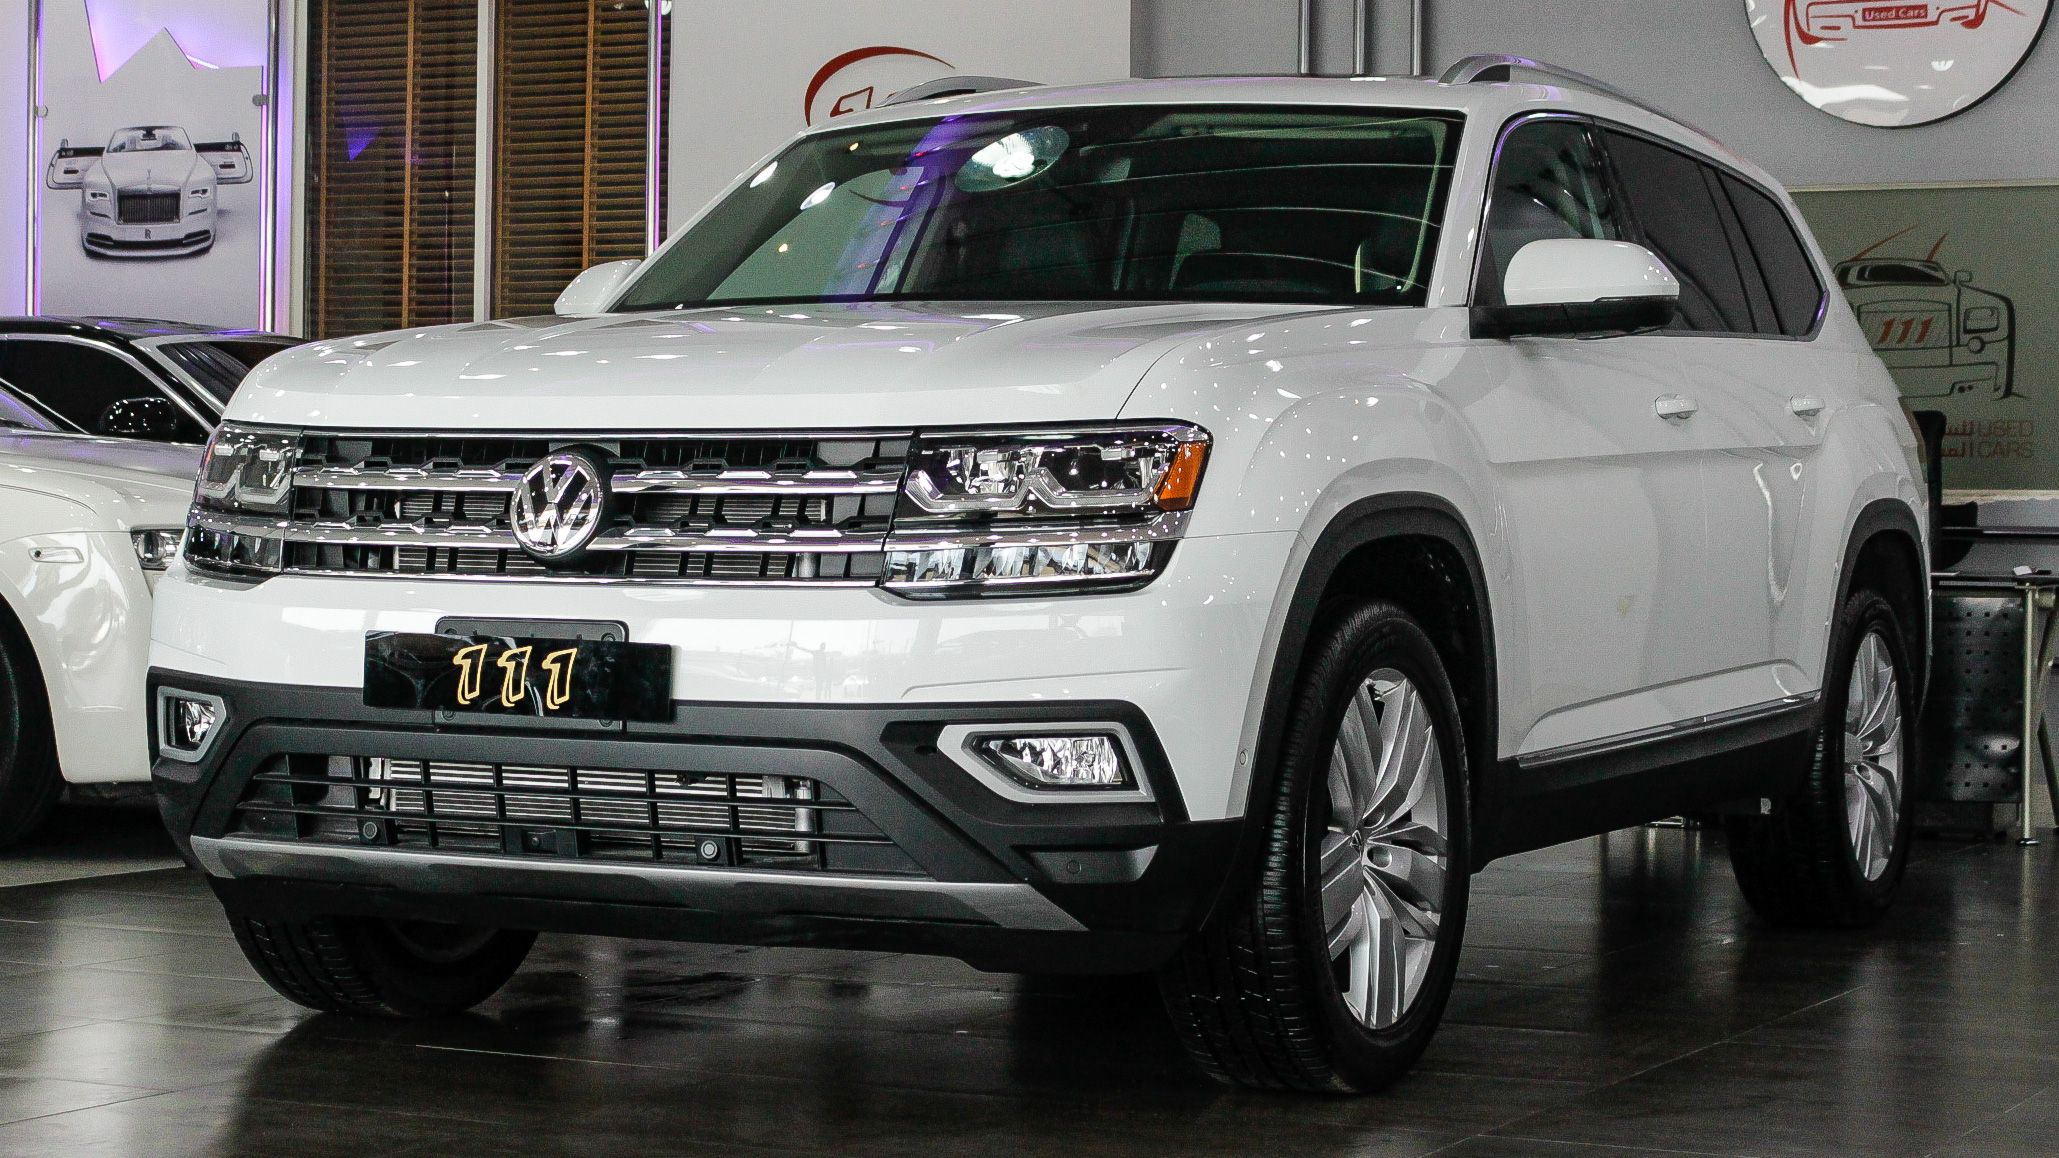 2019 Volkswagen Atlas 4motion 3 6l V6 Sel Premium In 2020 Volkswagen Car Atlas